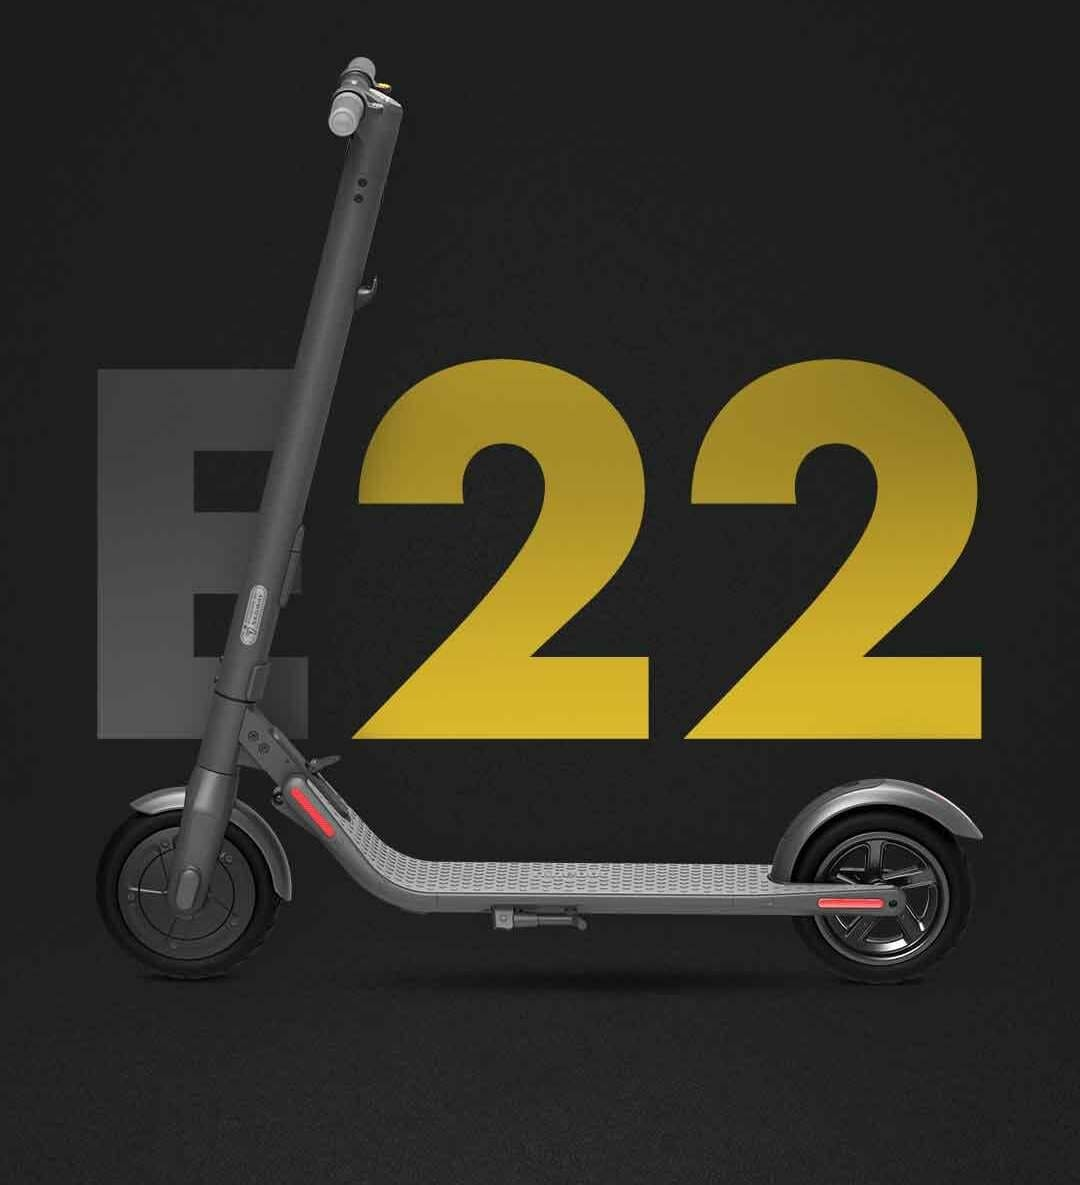 NineBot-E22.jpg